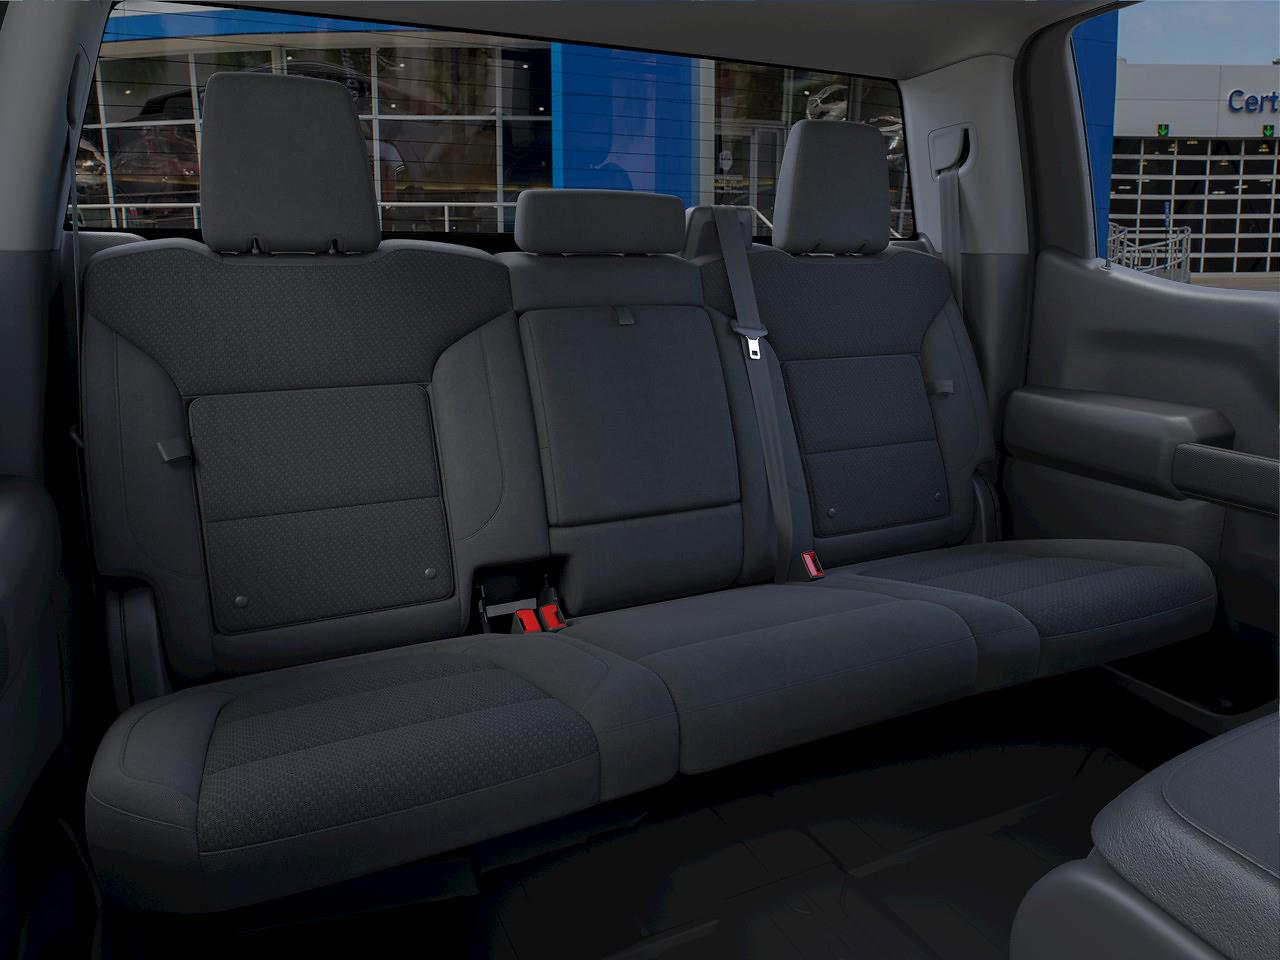 2021 Chevrolet Silverado 1500 Crew Cab 4x4, Pickup #72161 - photo 34